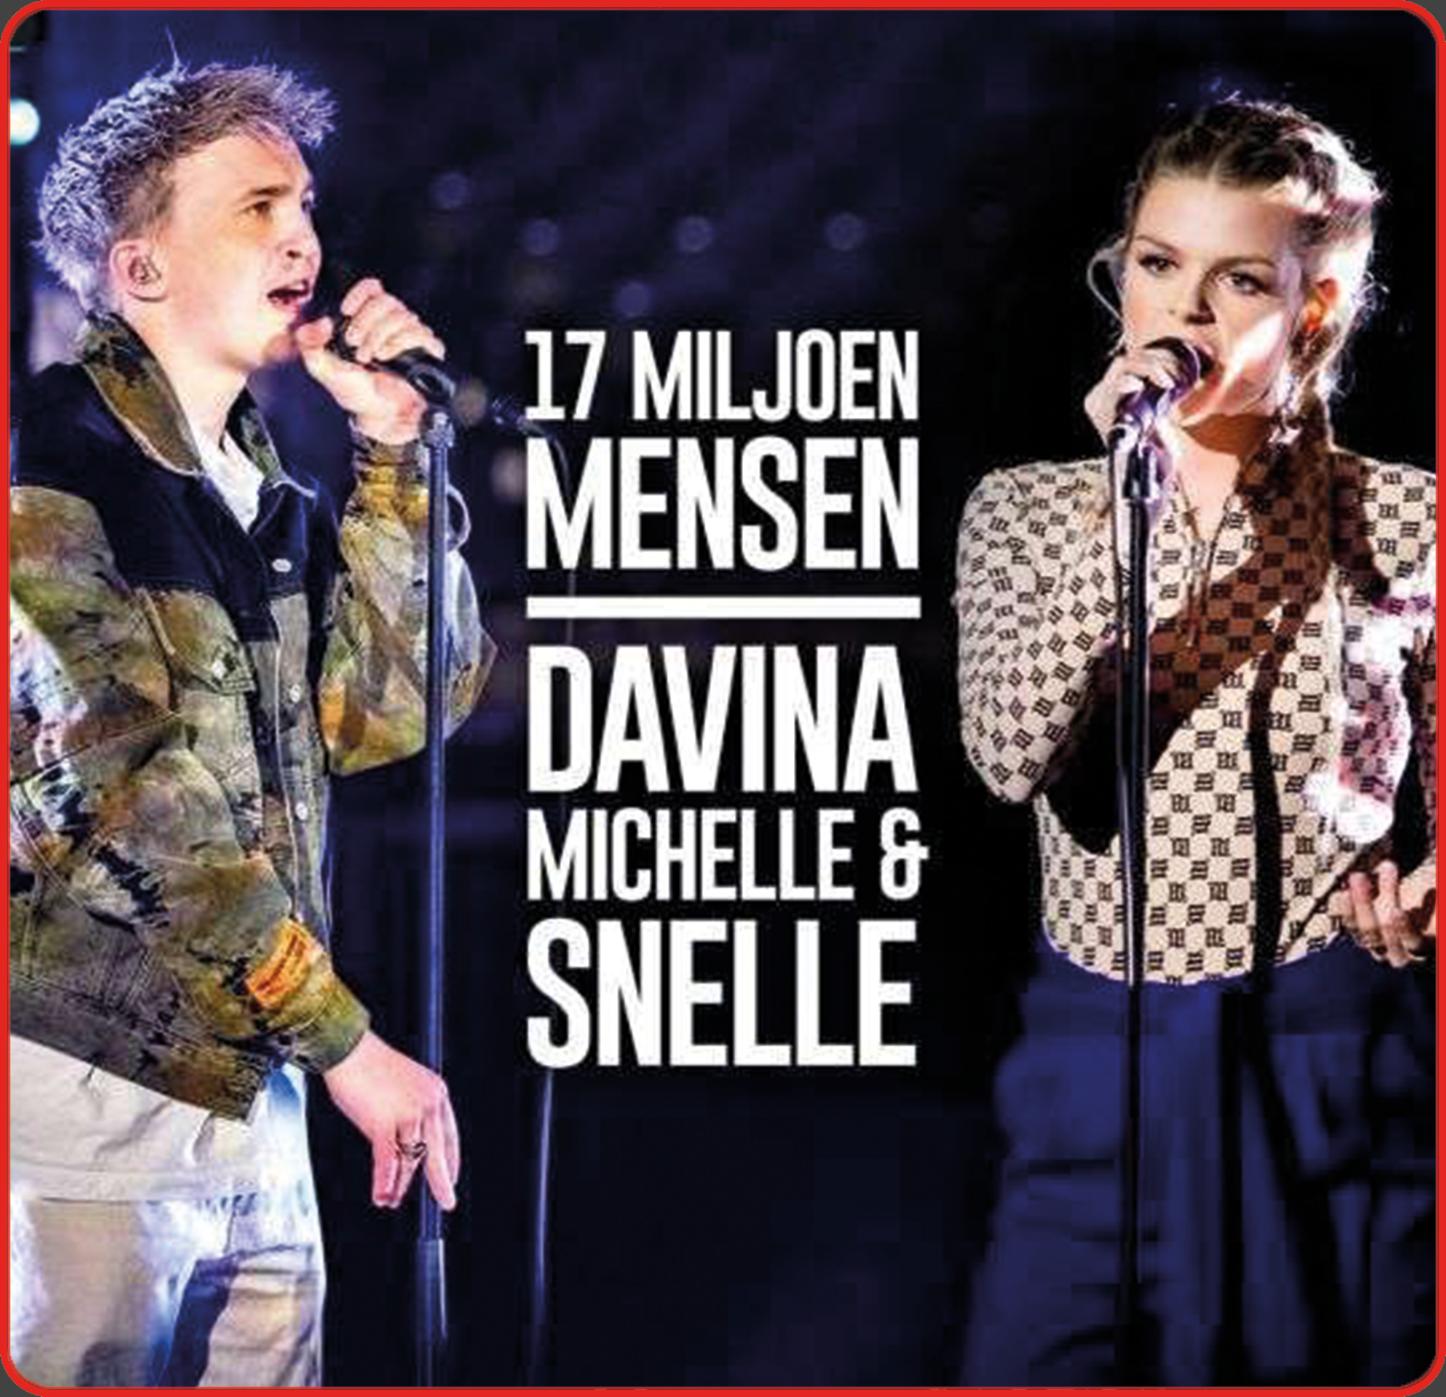 17 Miljoen Mensen [Davina Michelle & Snelle]